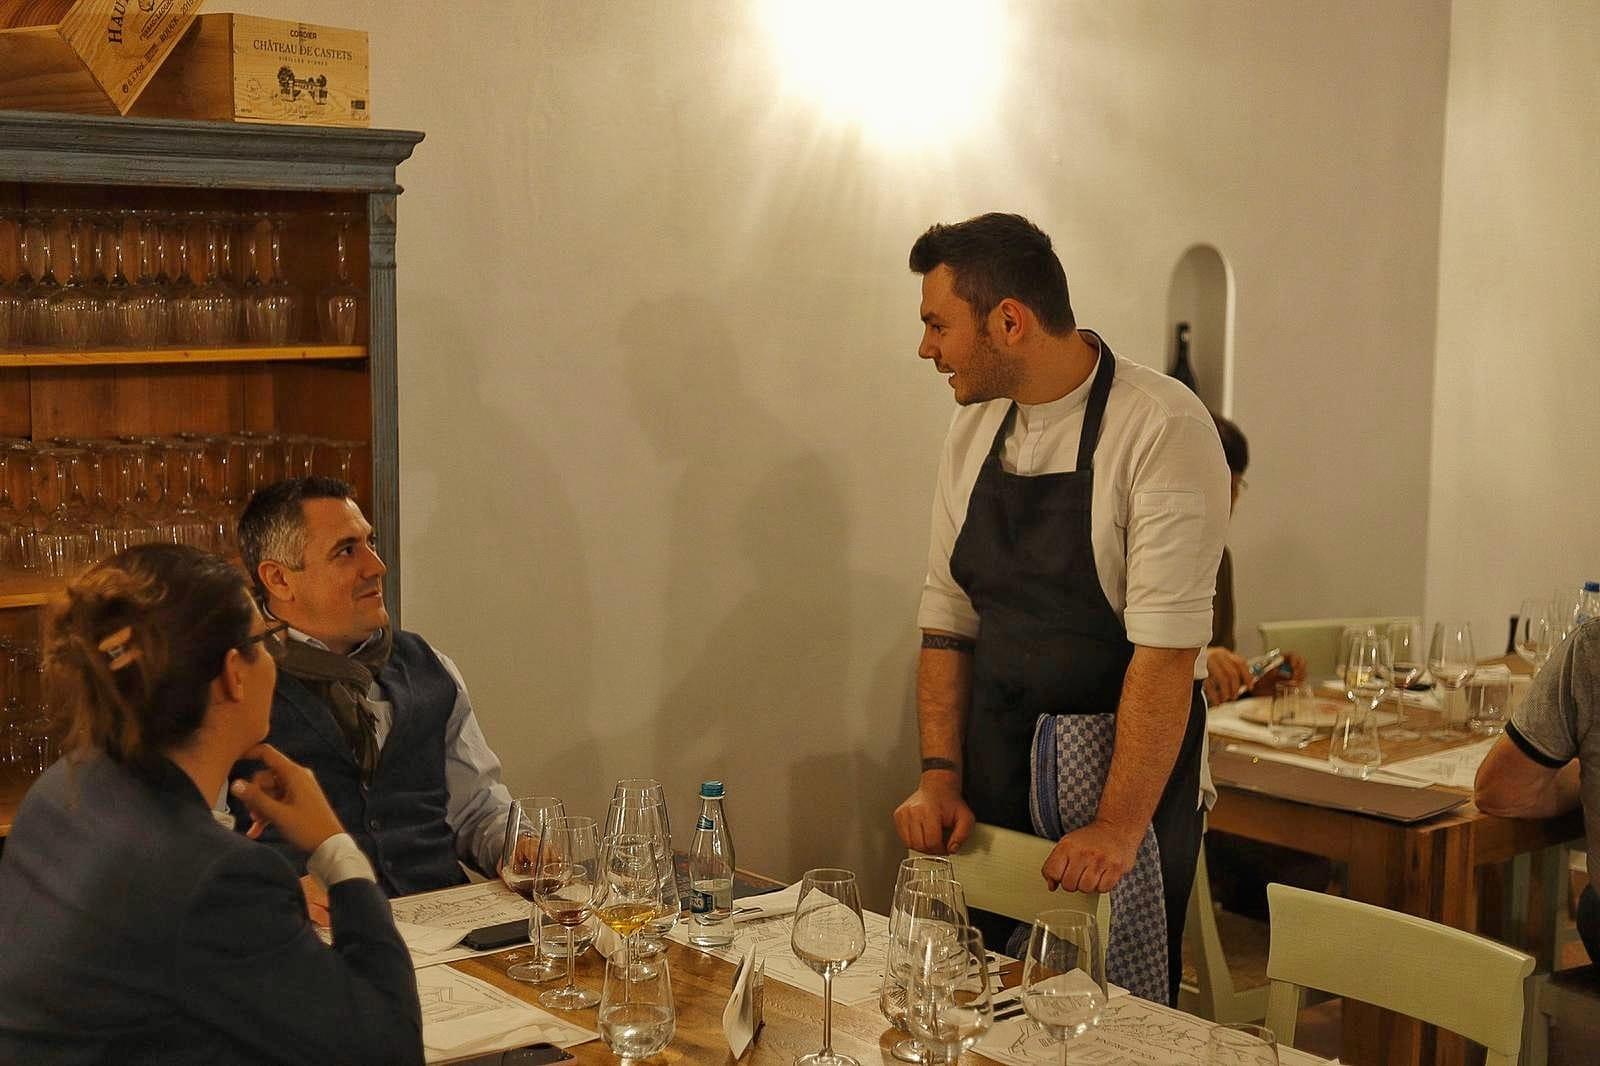 Chef Raul Vidican